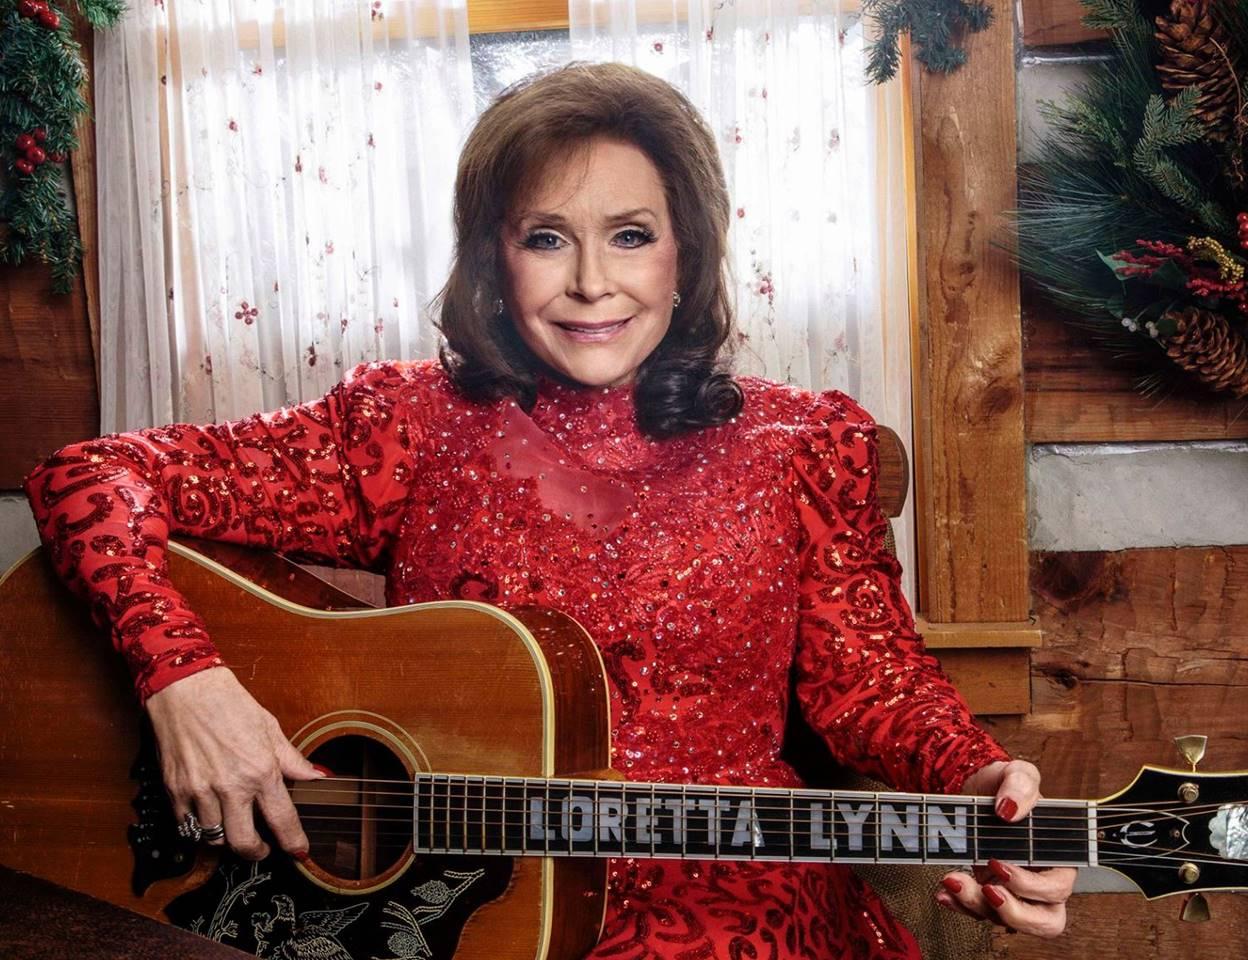 Loretta Lynn Quot To Heck With Ole Santa Claus Quot Video Amp Lyrics